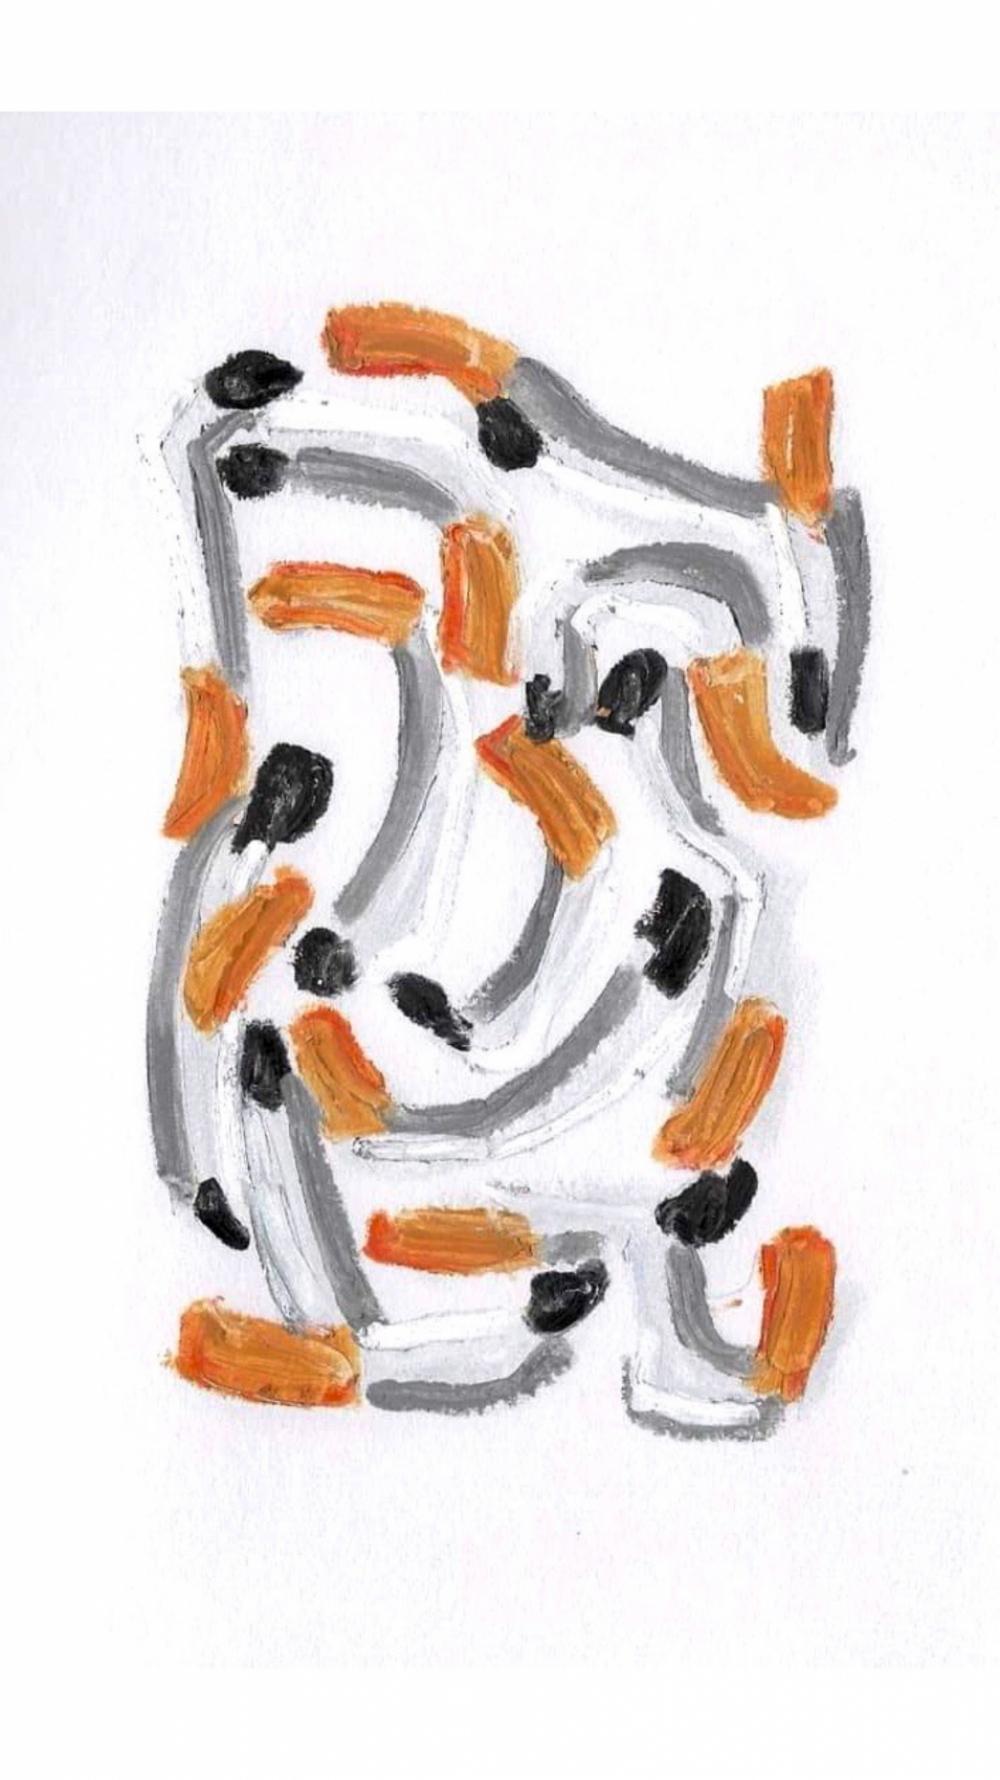 Anna Choutova - Cigarette Snakes 19 Oil Pastel on Paper21 cm x 15 cm